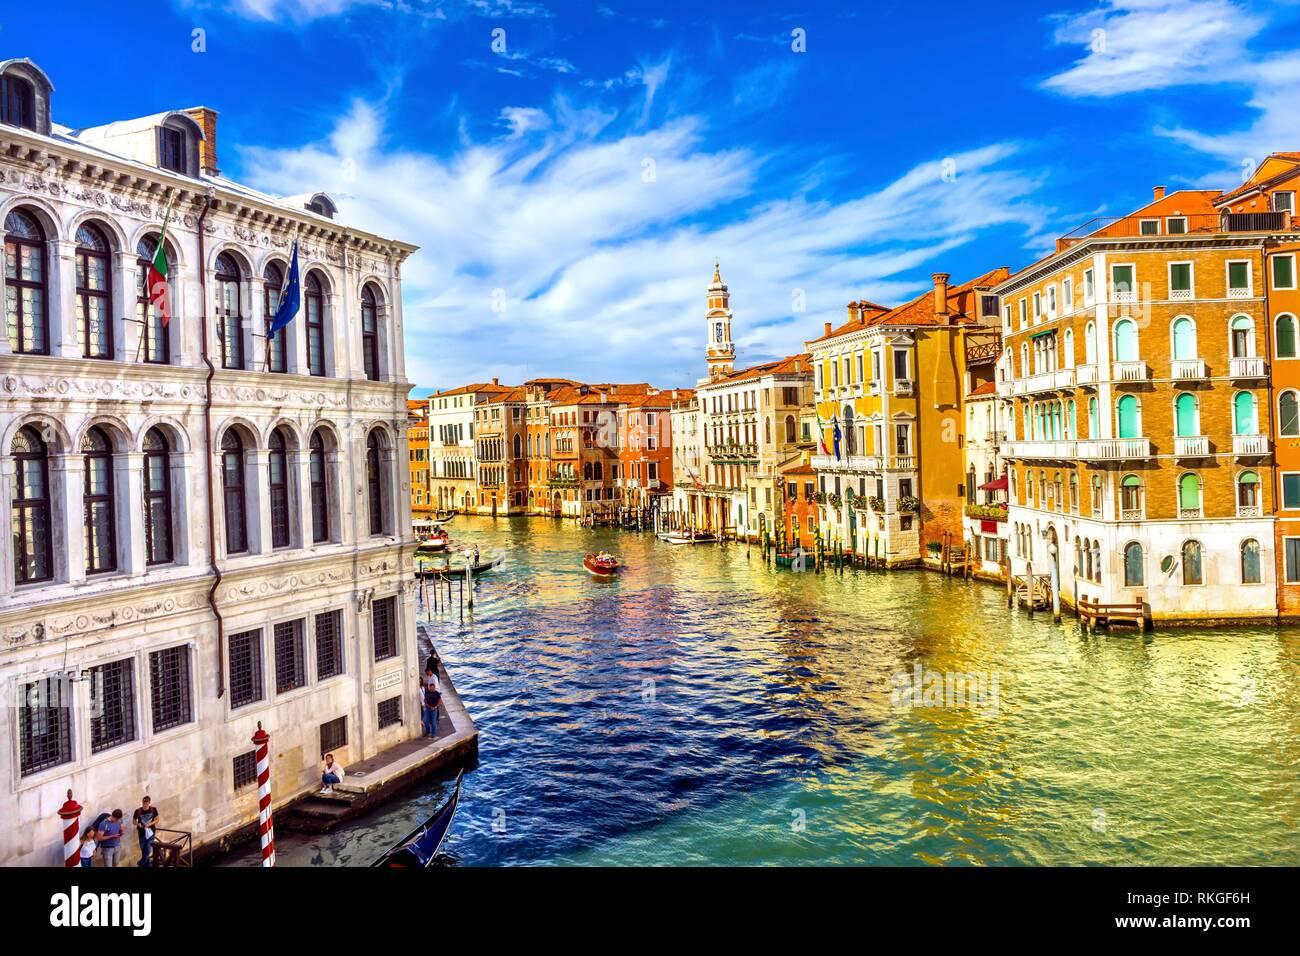 Colorful Grand Canal From Rialto Bridge Touirists Grand Canal Venice Italy. Stock Photo